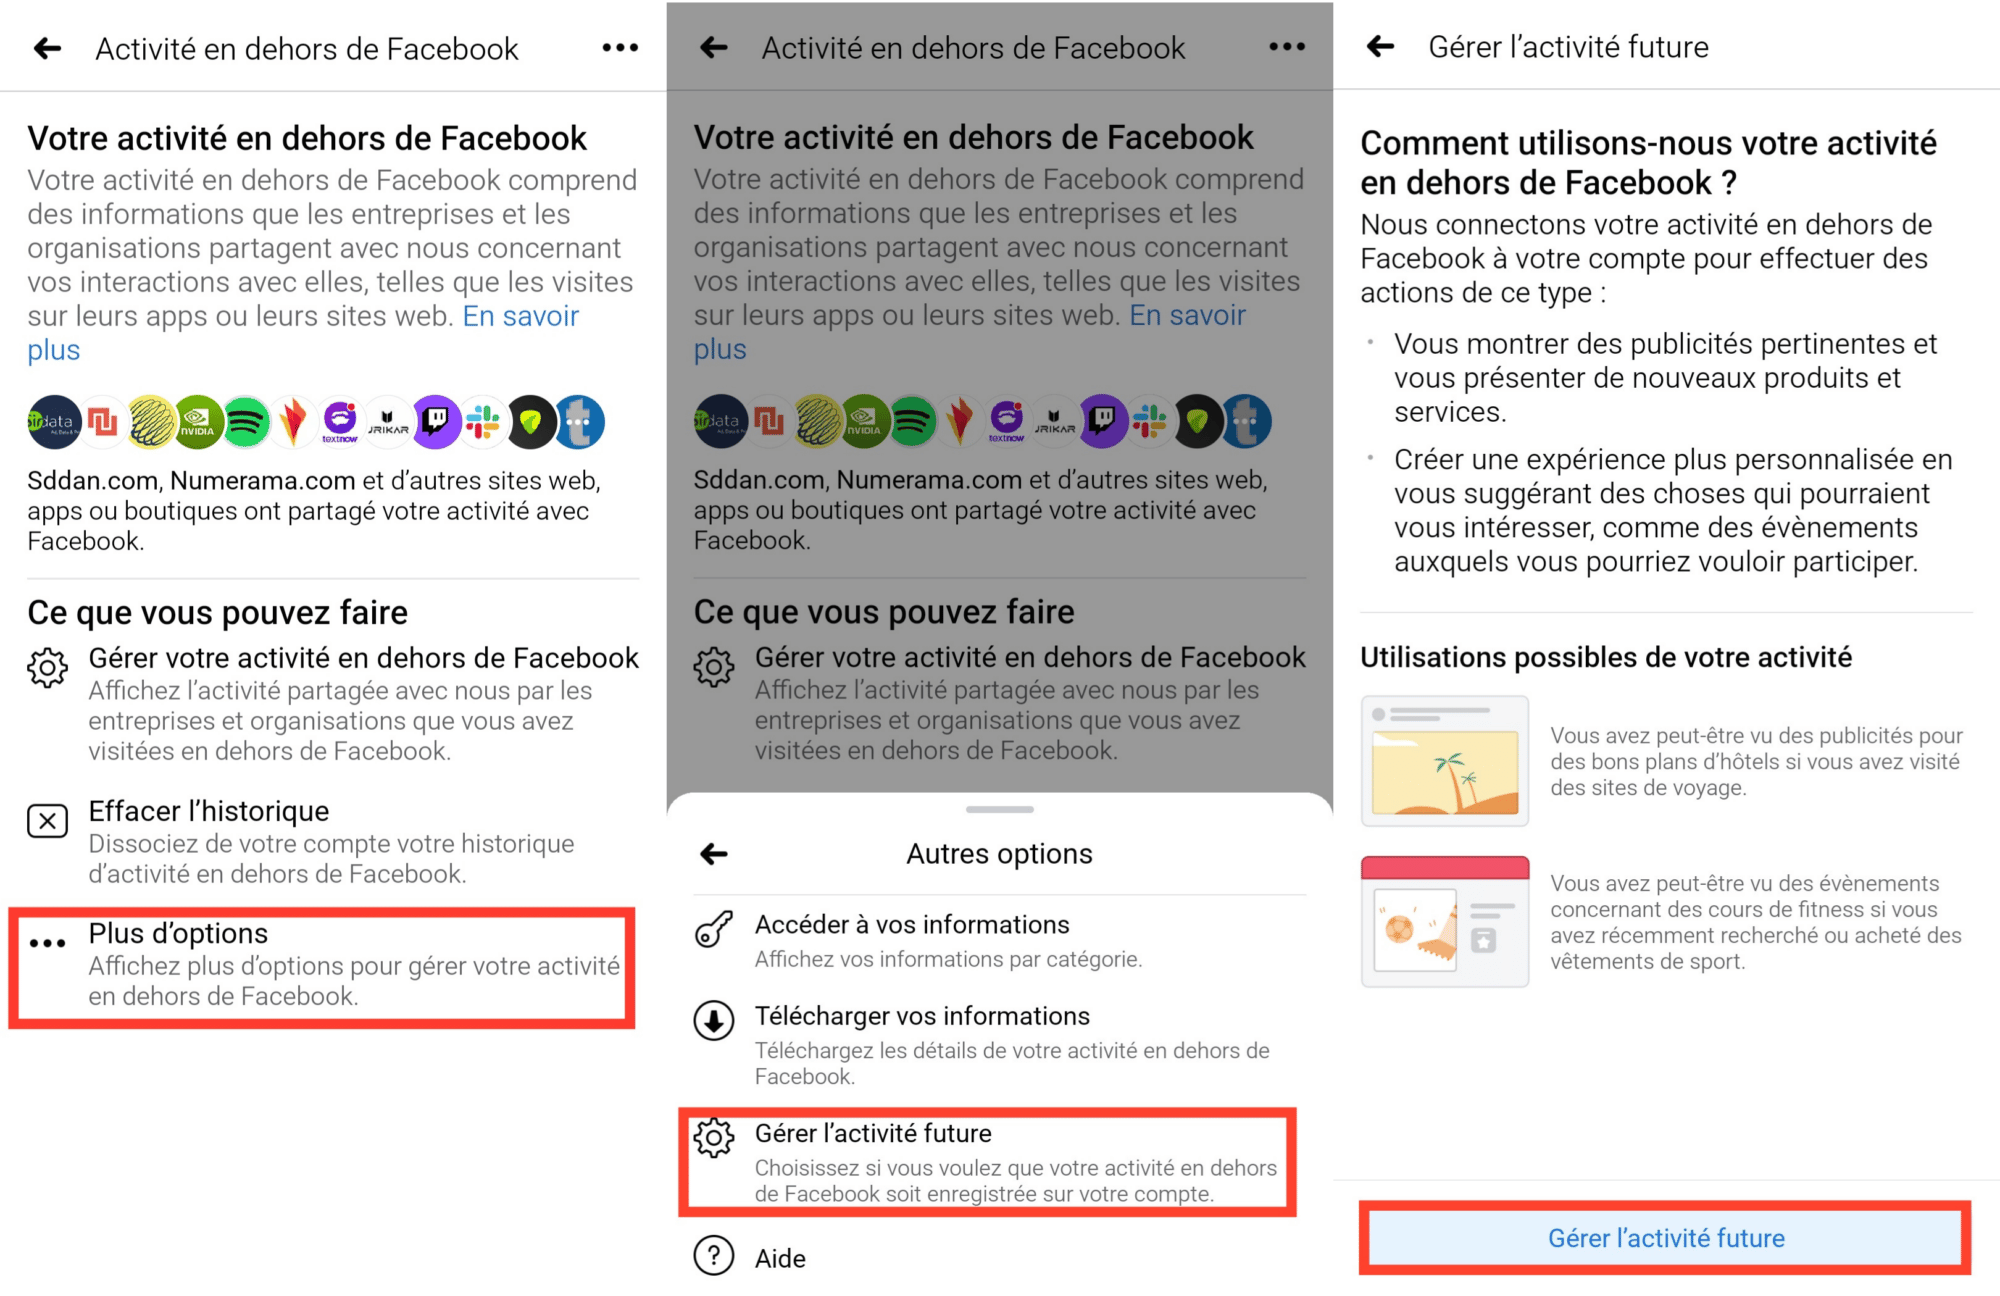 gerer-activite-future-facebook